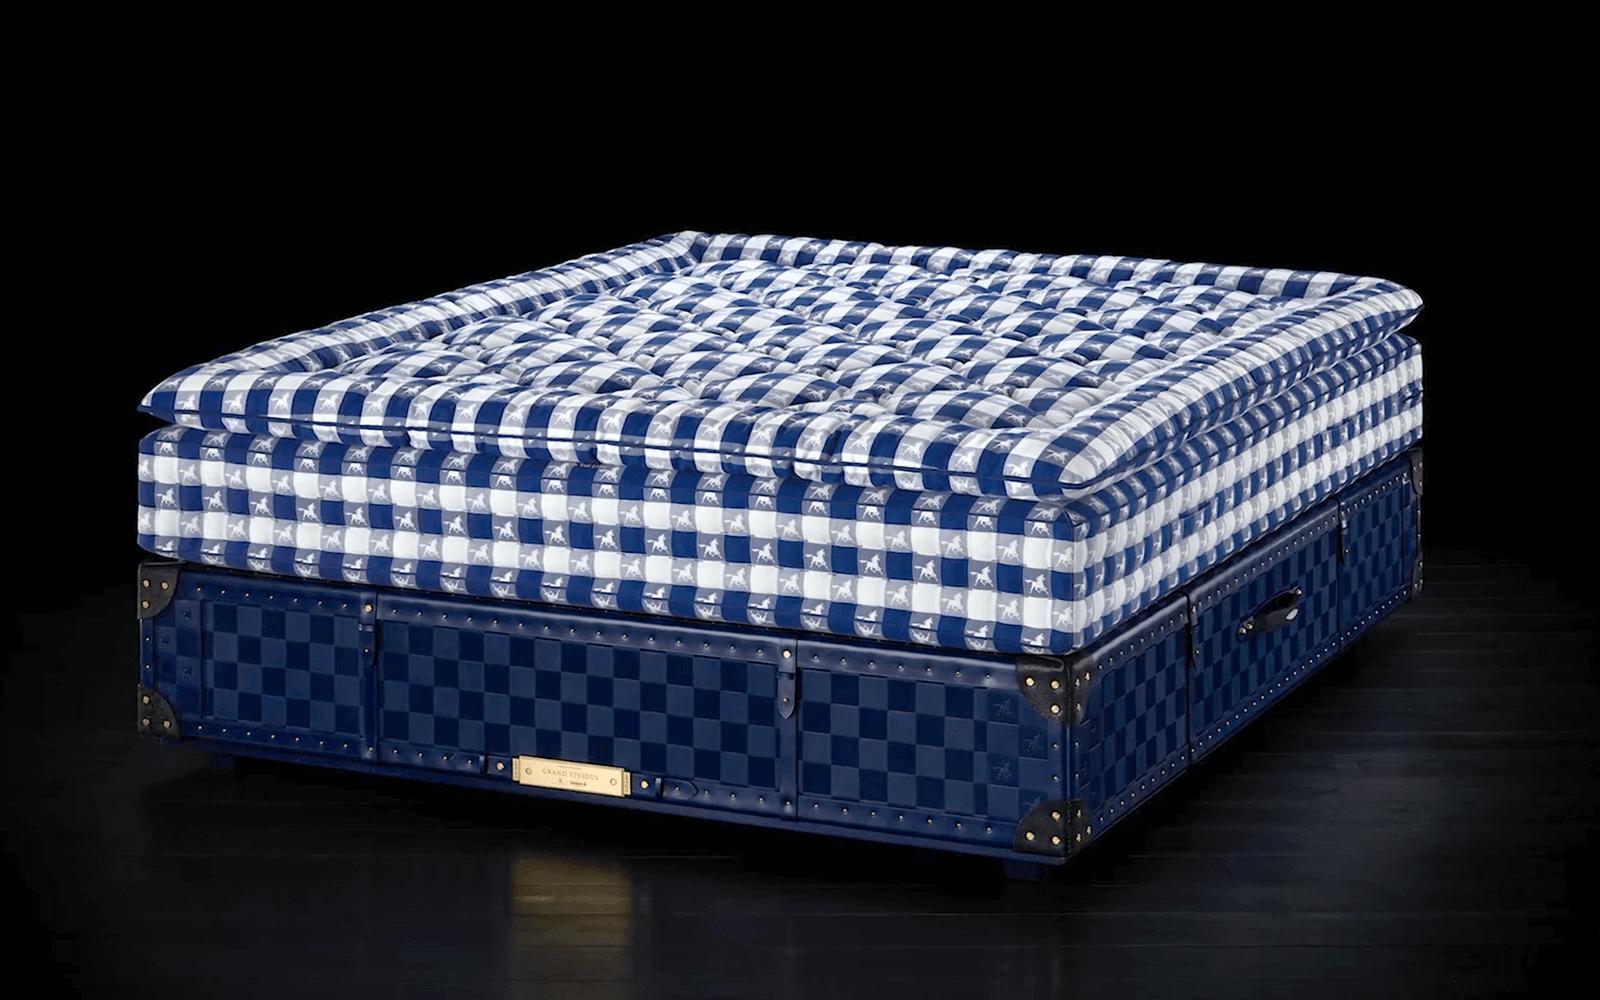 Hastens najdroższe łóżko świata Oferta Vispring